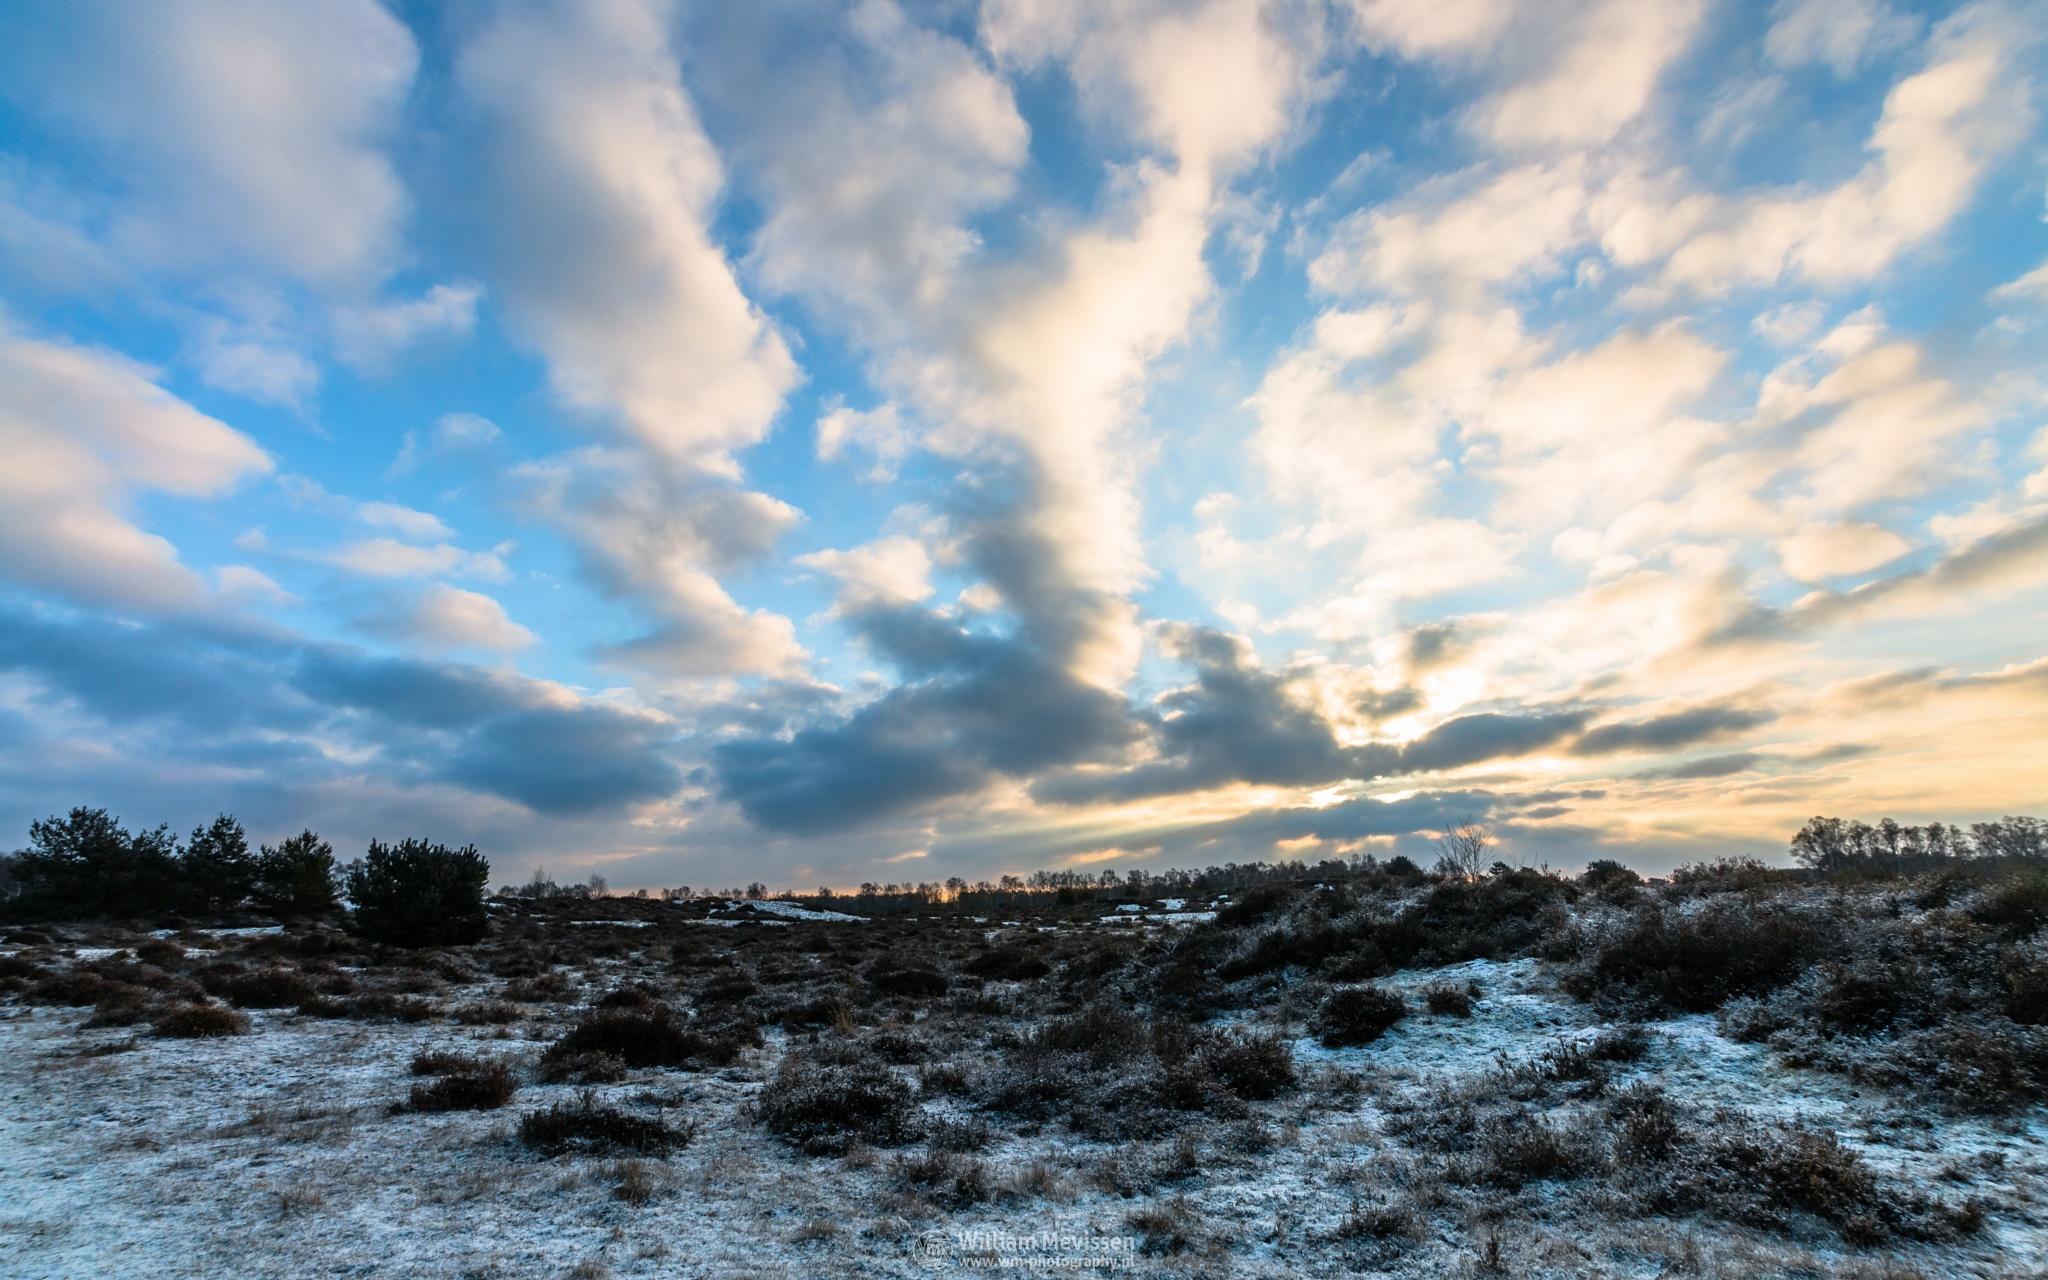 Photo in Landscape #bergerheide #forest #woods #heathland #maasduinen #limburg #noord-limburg #nieuw-bergen #bergen #national park #nature #sand #dunes #sanddunes #tree #trees #sky #clouds #twilight #snow #ice #winter #heather #cloudy #sunrise #sun